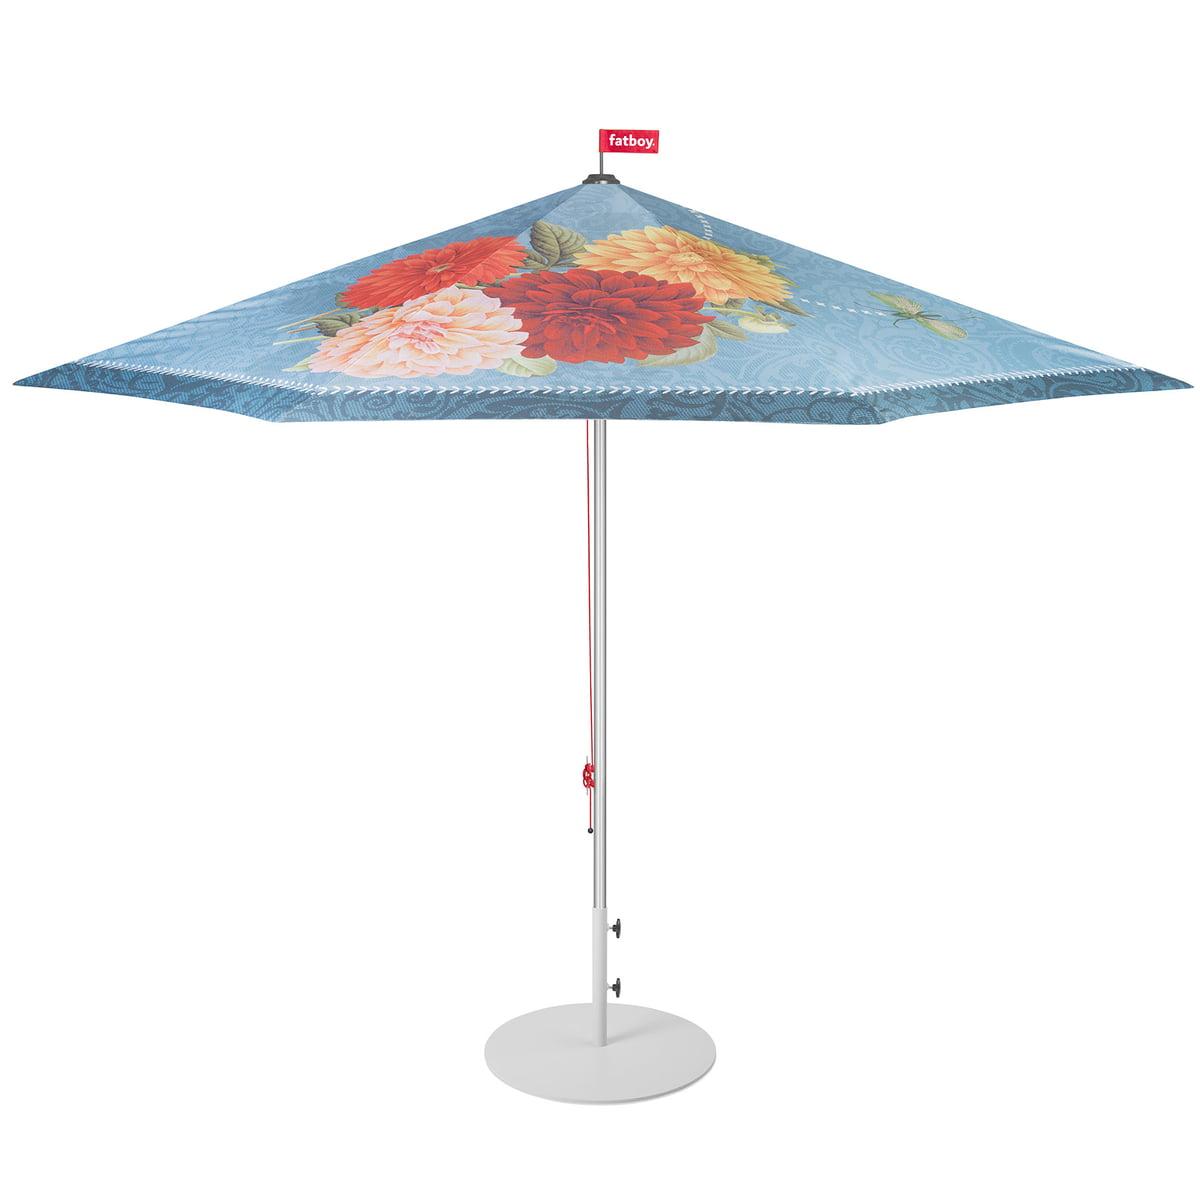 Buy the Parasolasido parasol by Fatboy